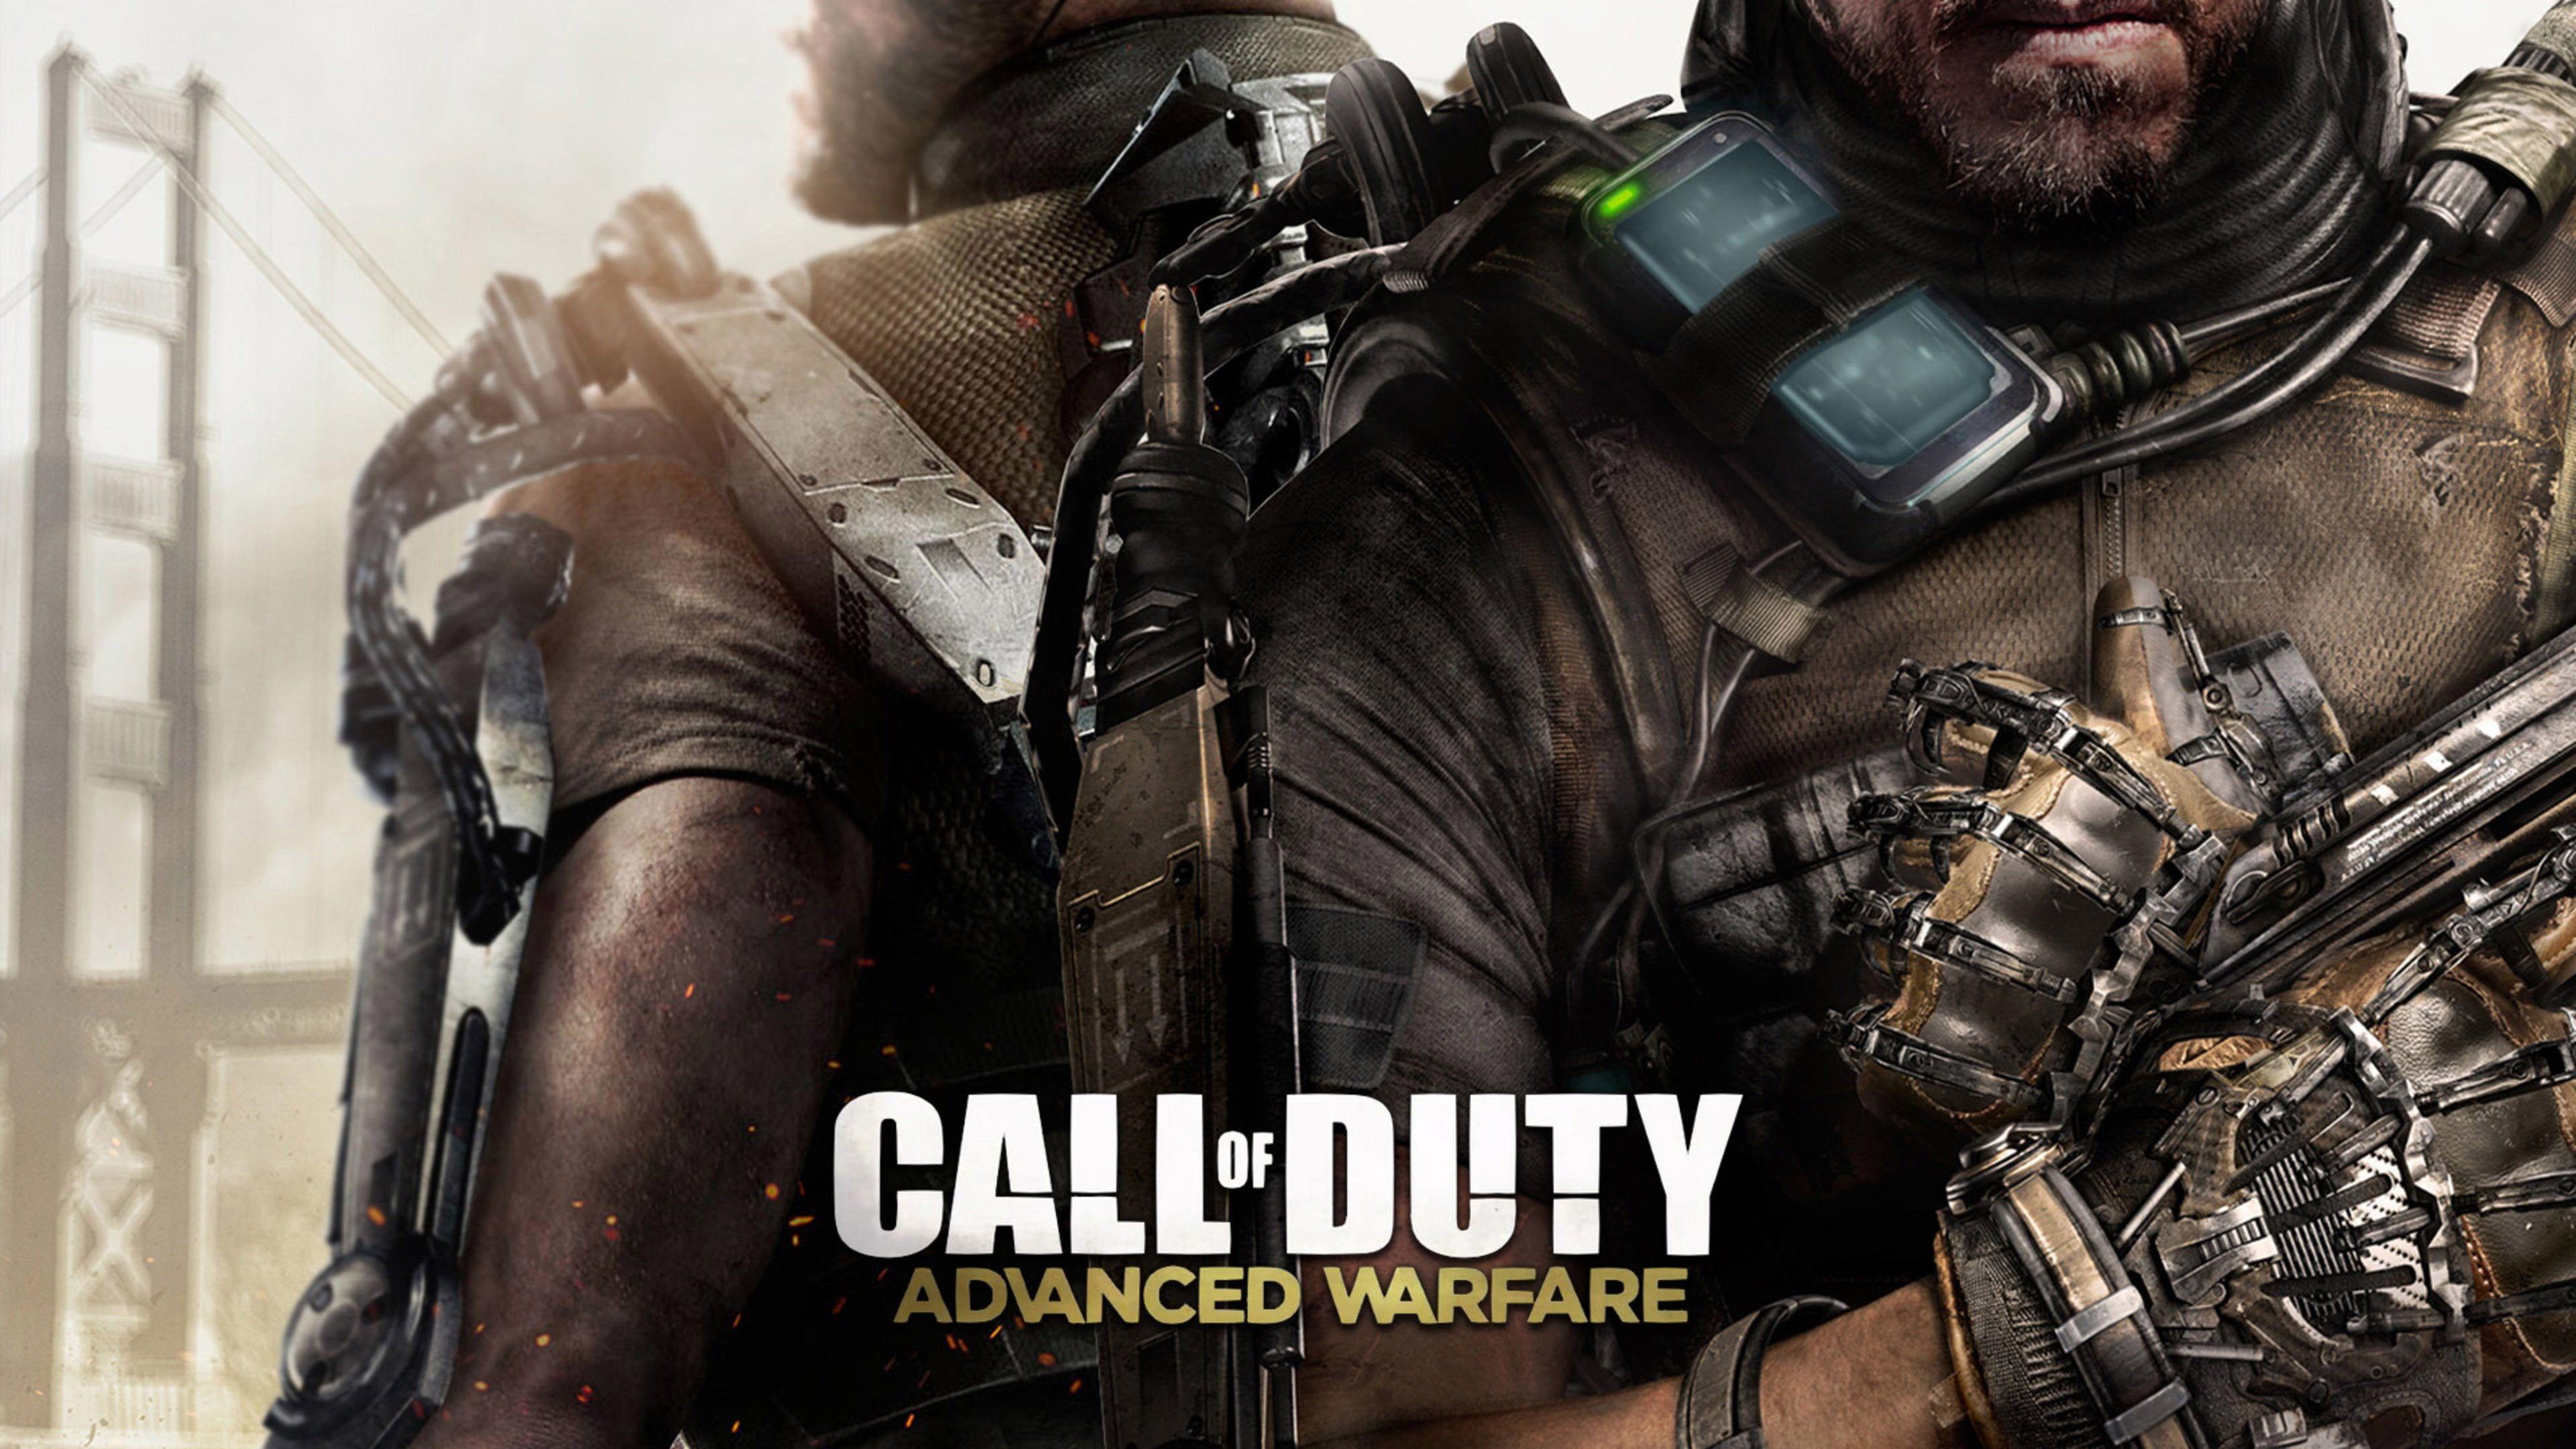 Cod Advanced Warfare Wallpaper Call Of Duty Advanced Warfare